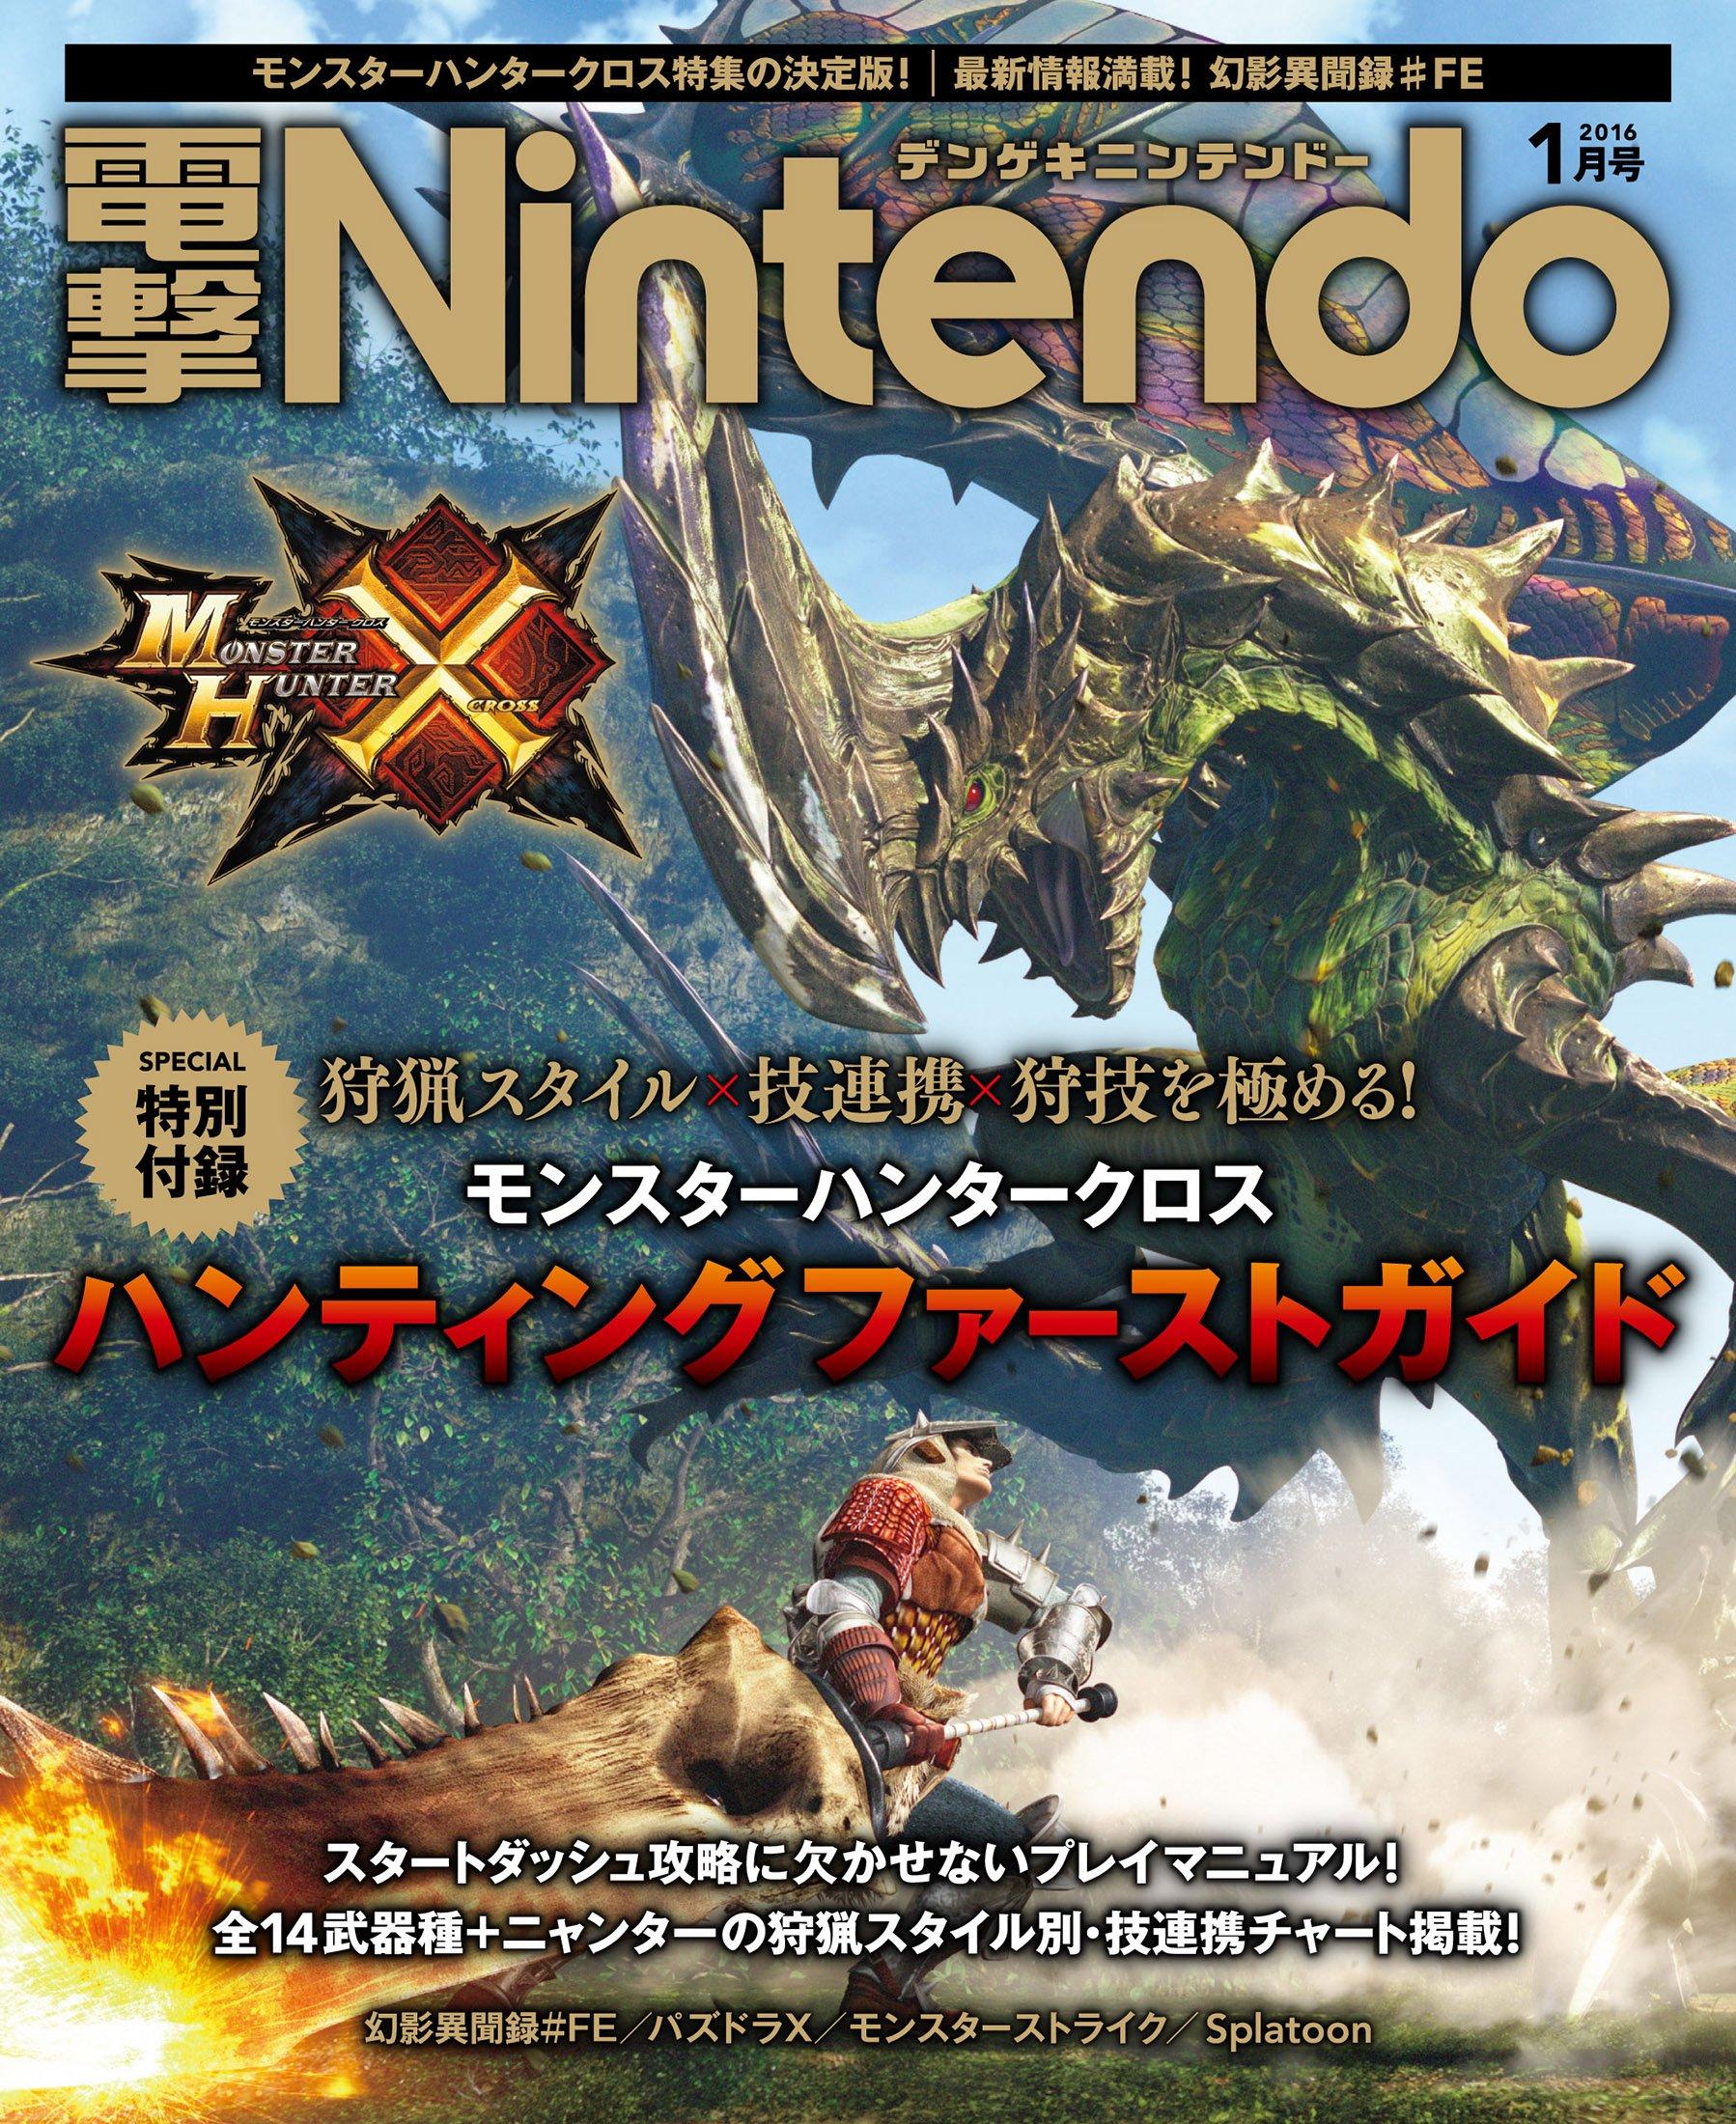 Dengeki Nintendo Issue 032 (January 2016)